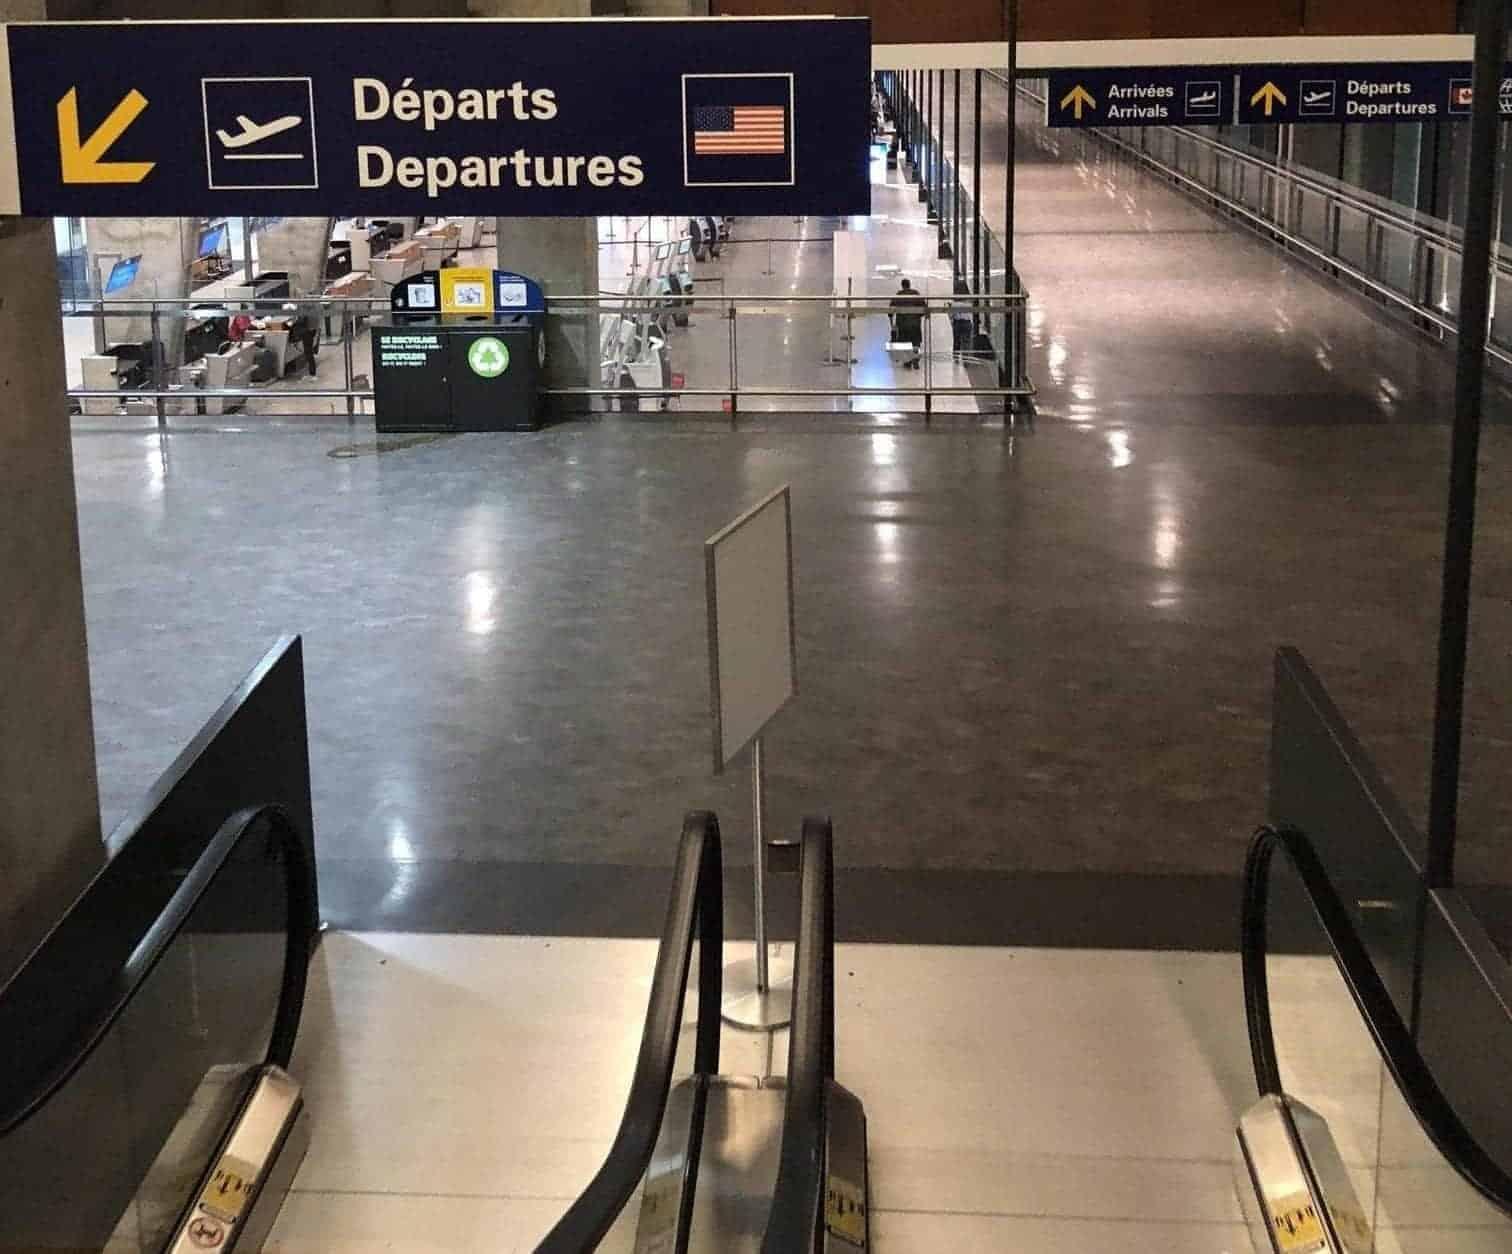 marriott terminal aeroport montreal yul 56